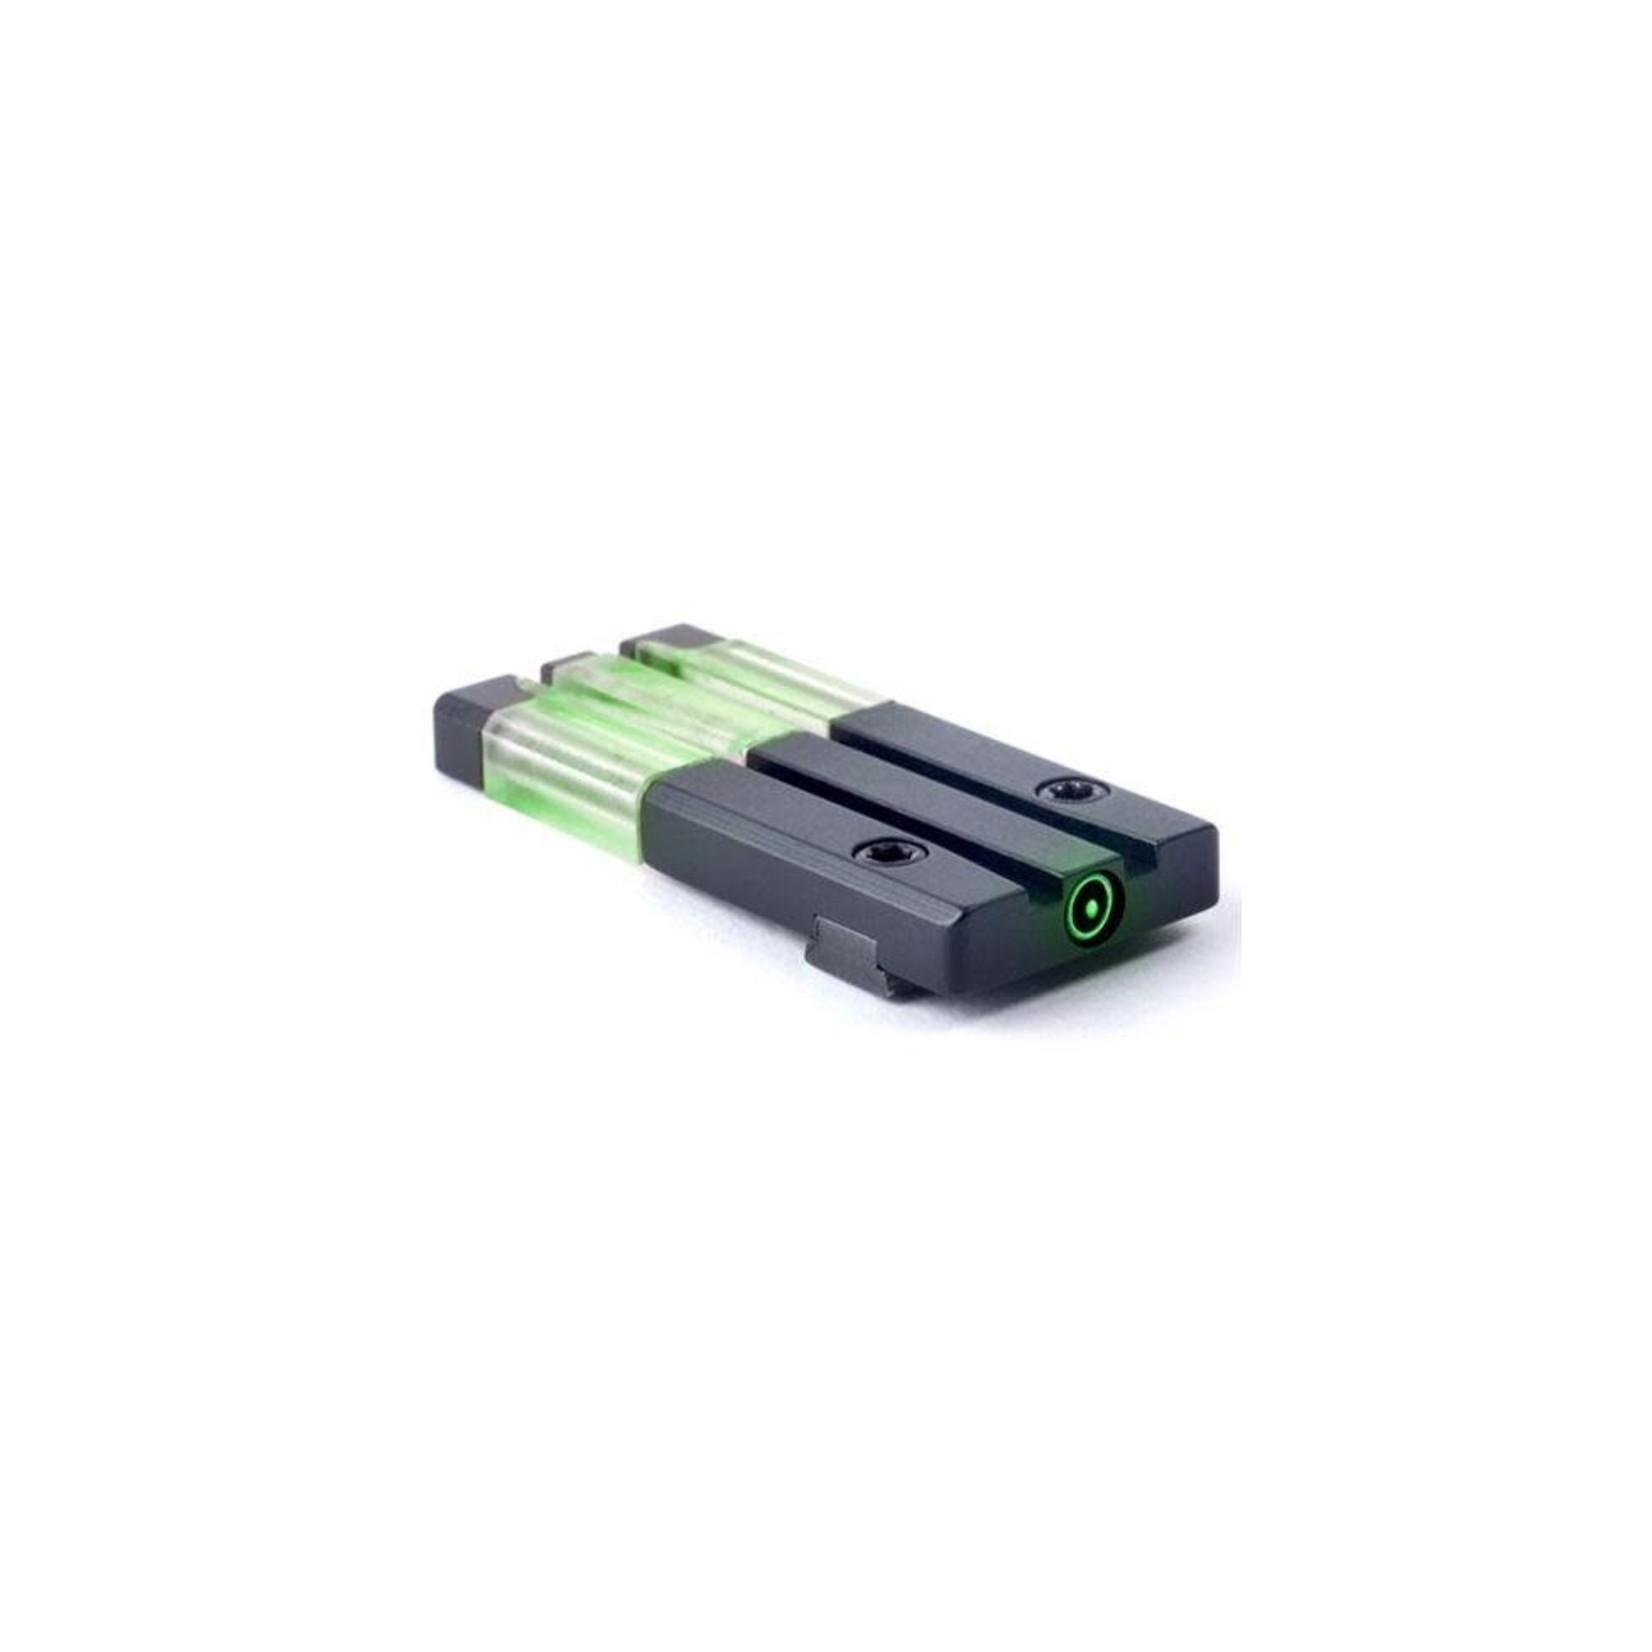 Meprolight Meprolight ML63102 Fiber-Tritium Bullseye Green Sight for Glock Models: 42,43